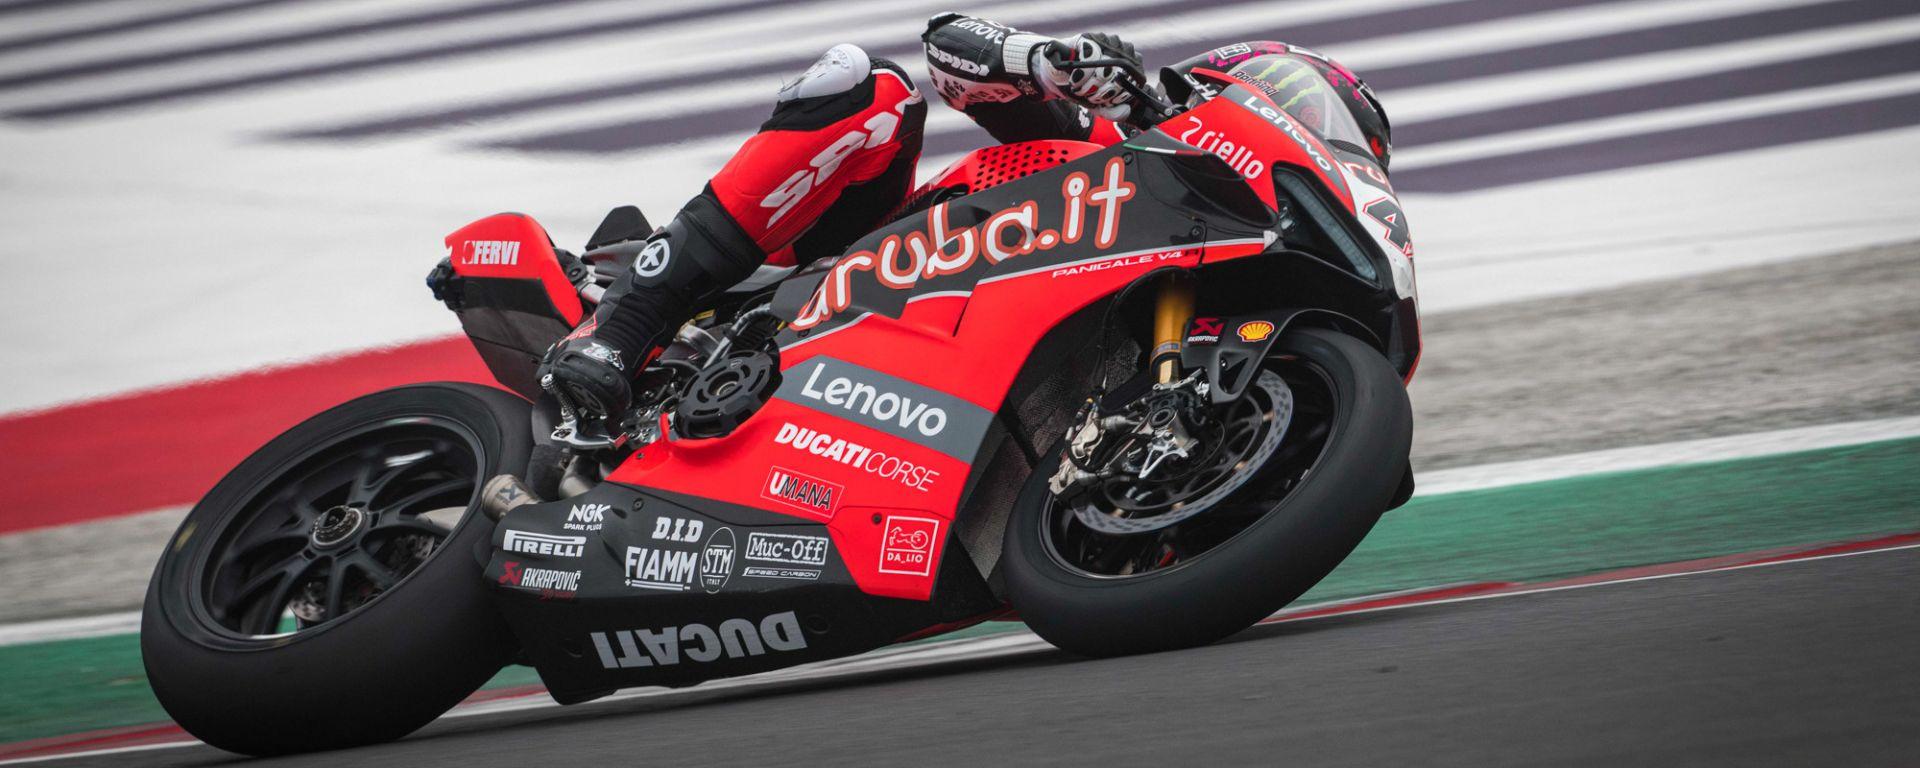 Test Misano SBK 2021, Scott Redding (Ducati)